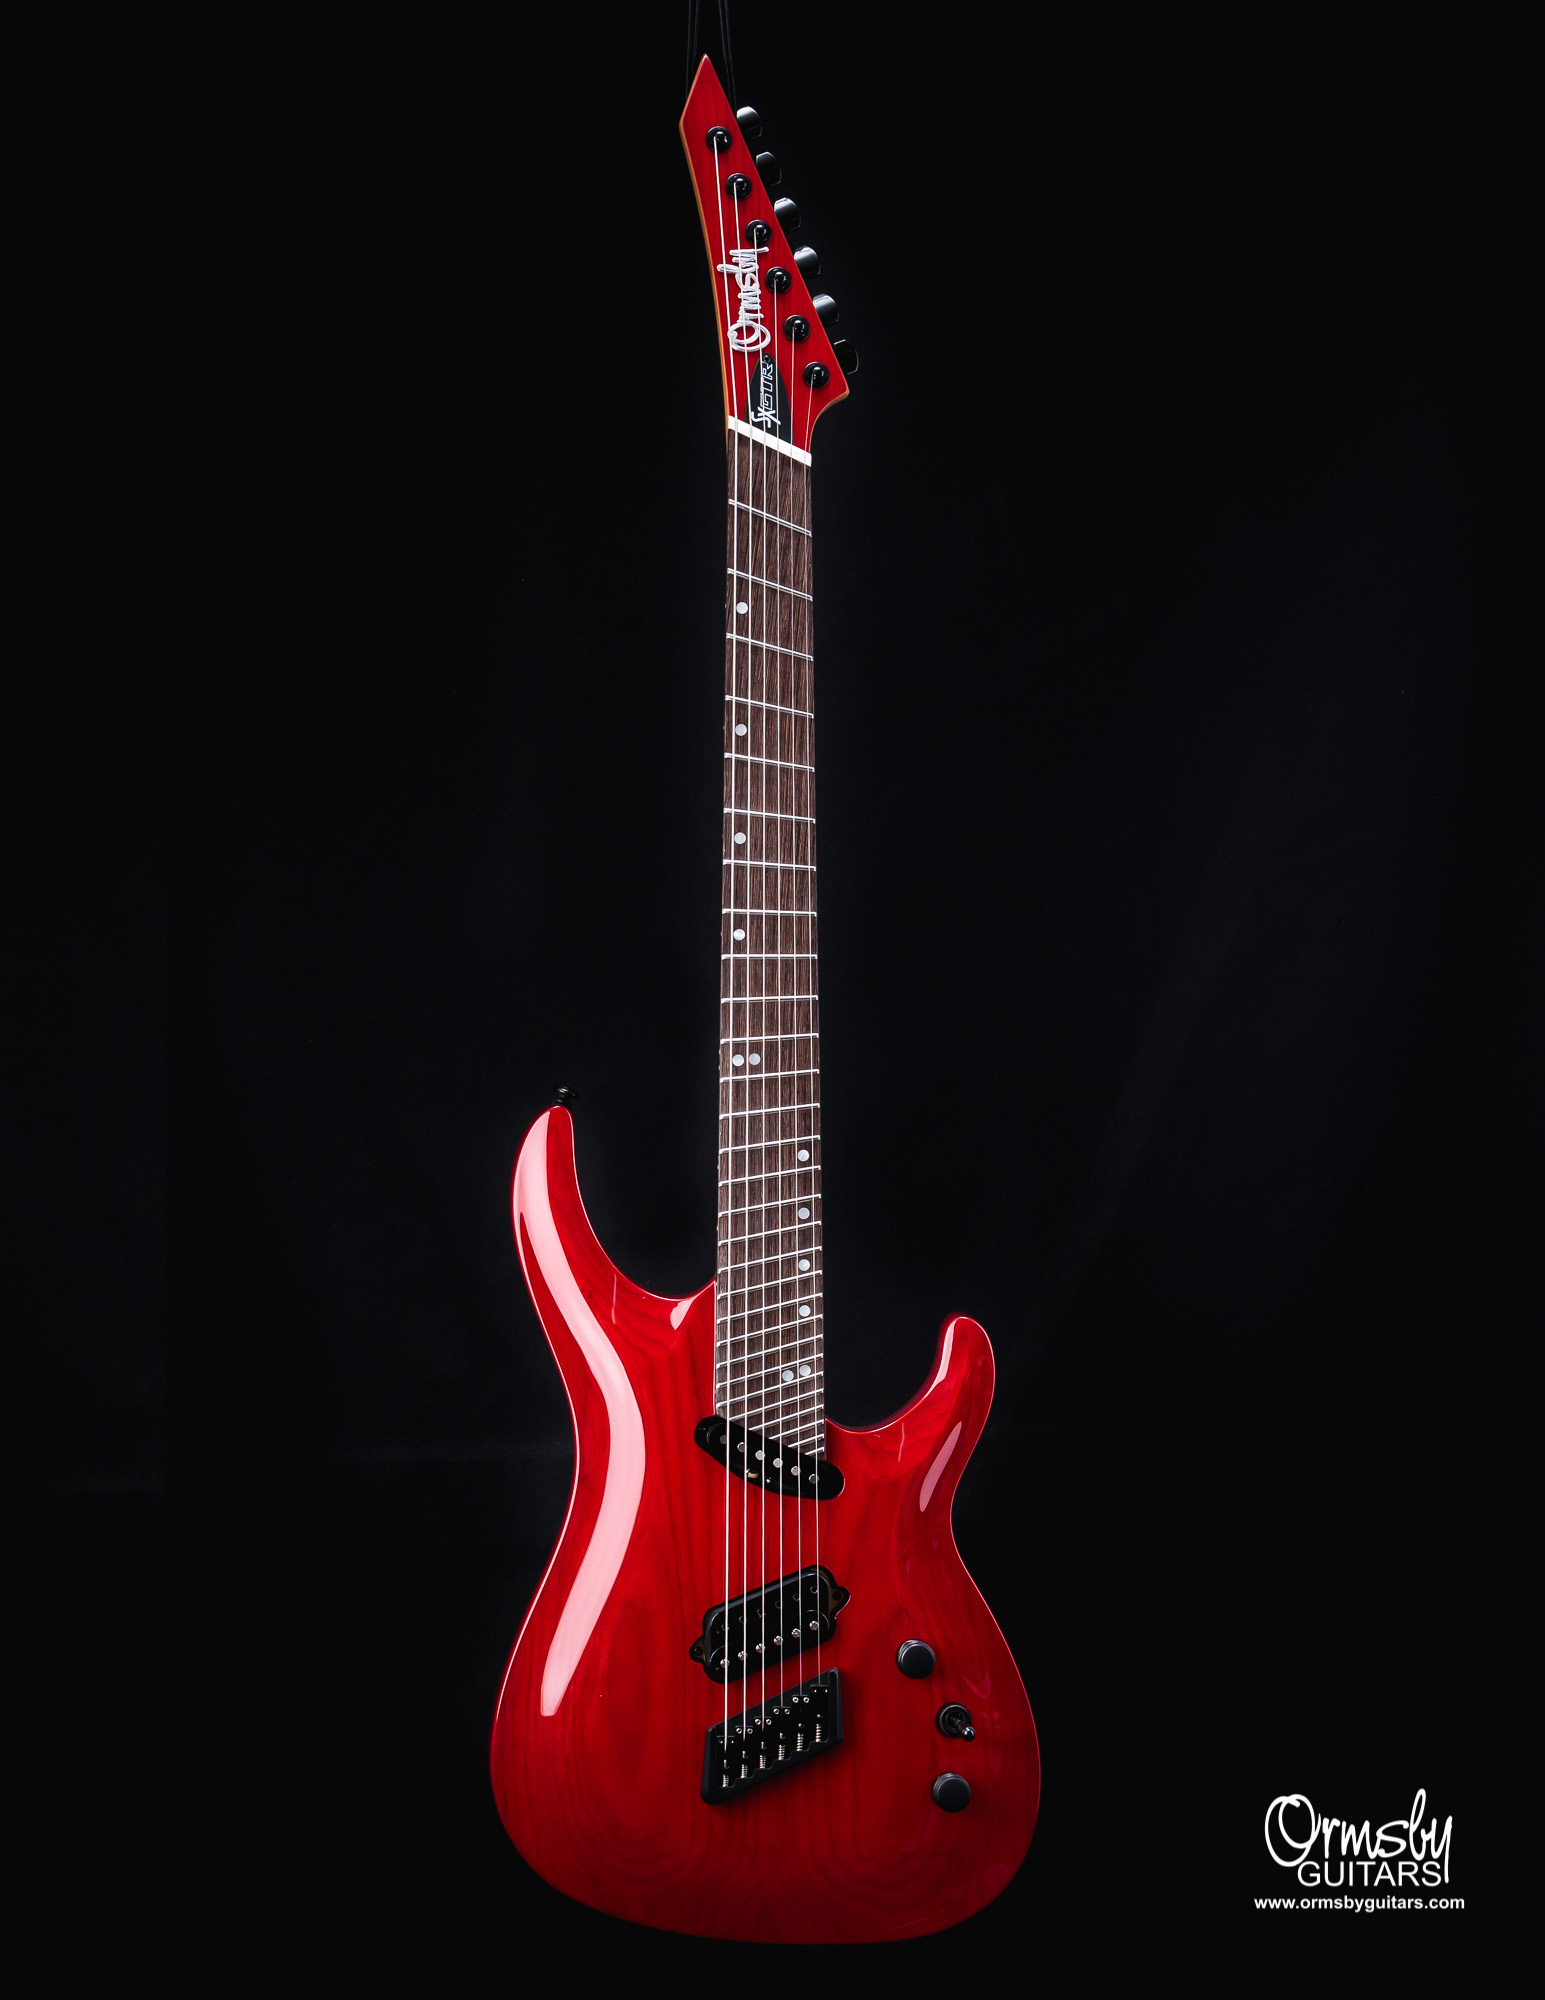 Ormsby Guitars Run 10 SX